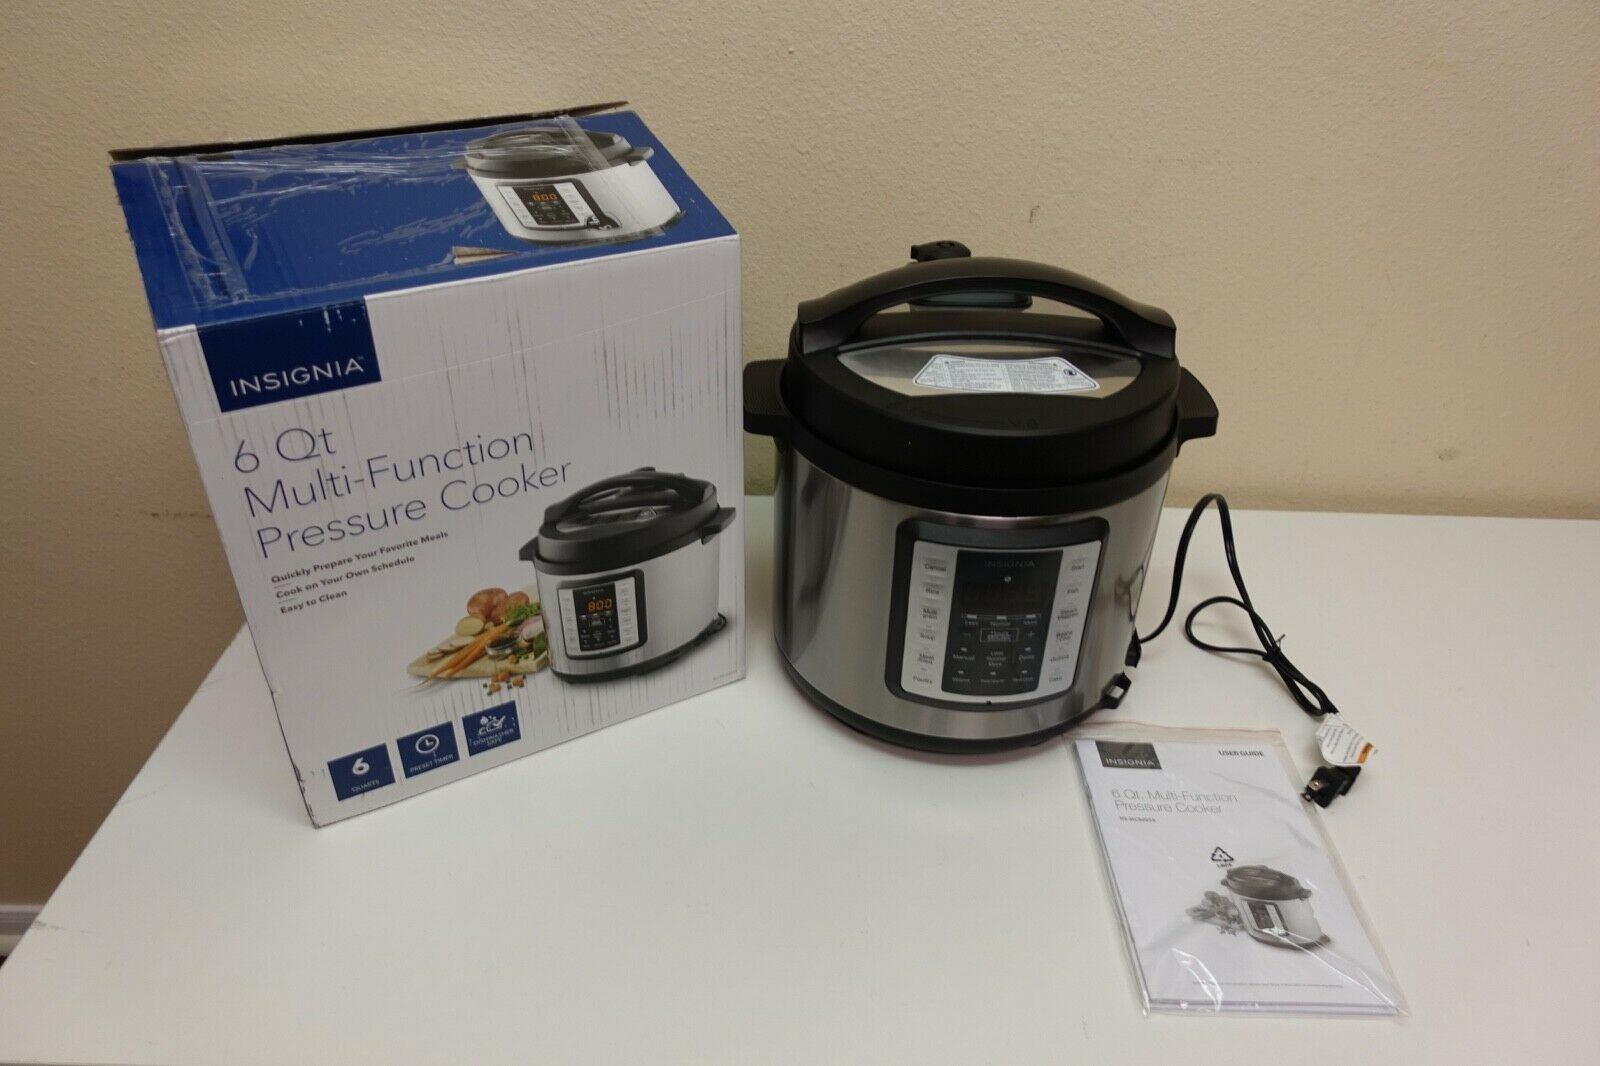 Insignia- 6-Quart Multi-Function Pressure Cooker - Stainless